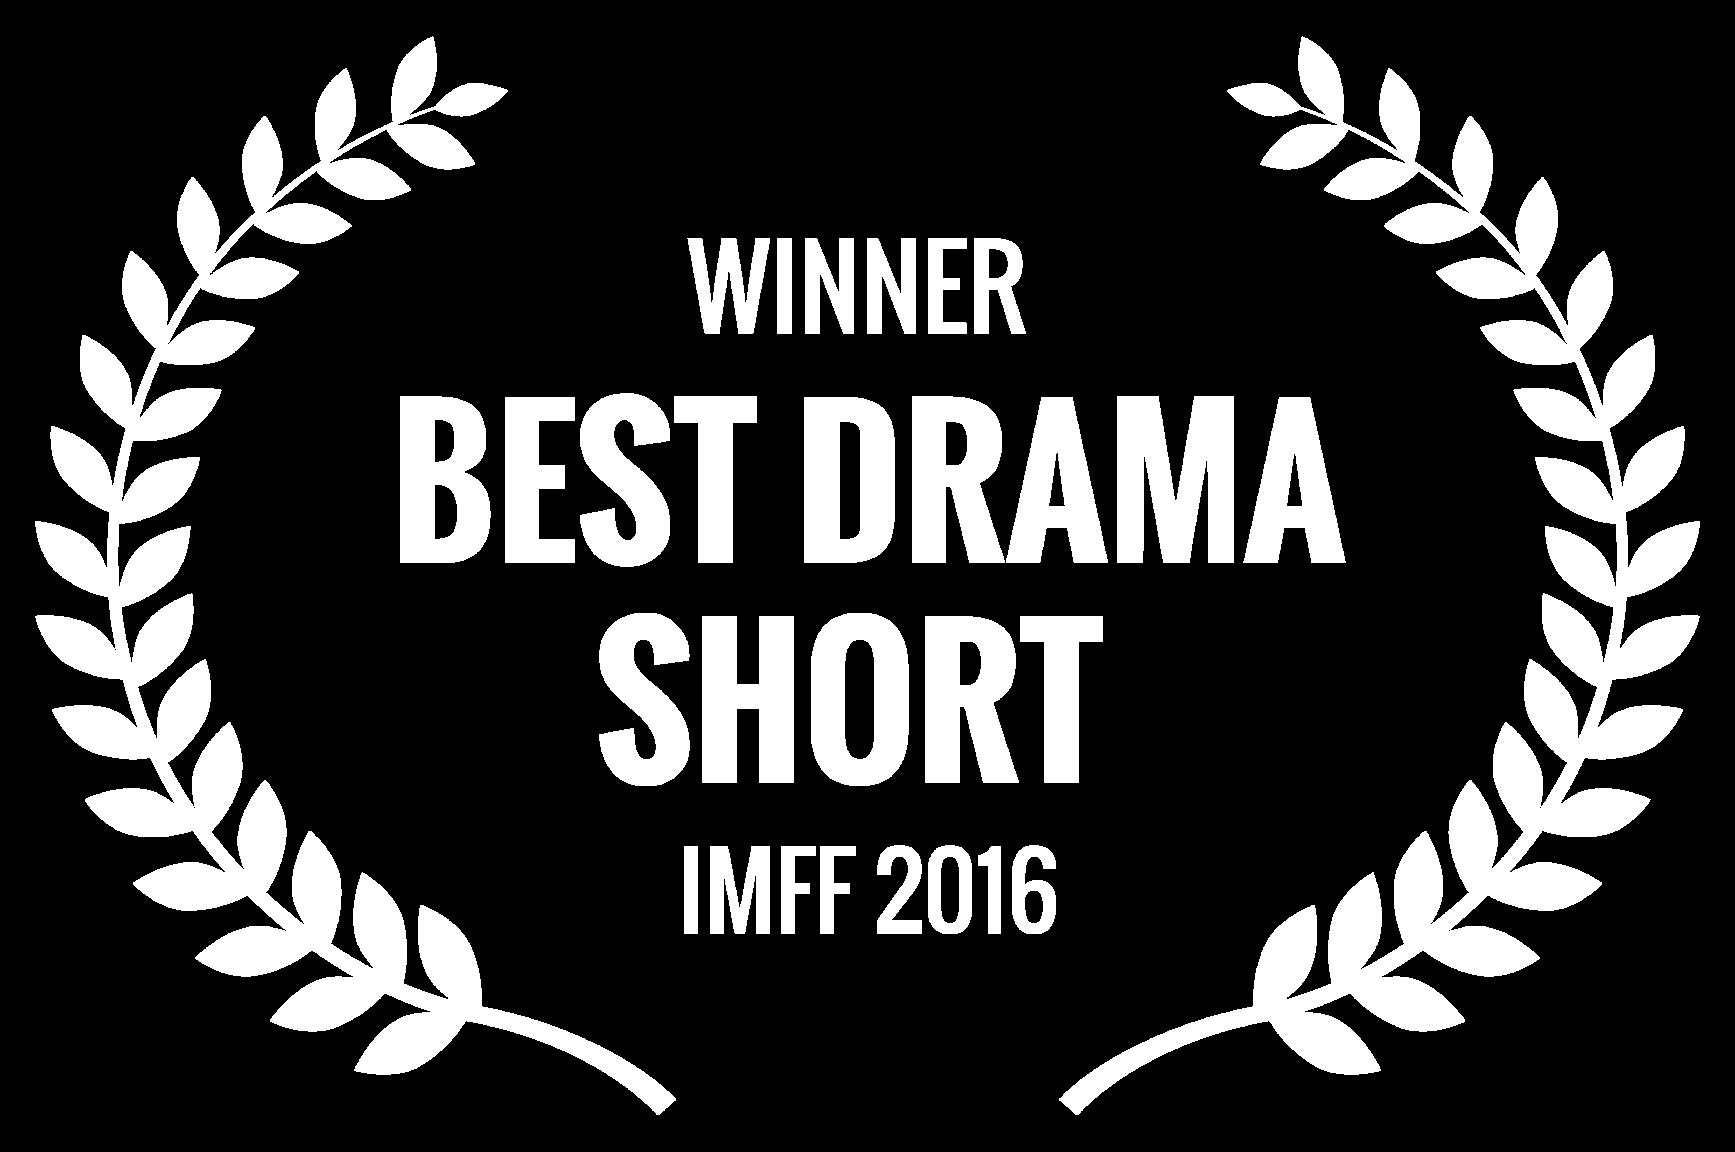 WINNER  - BEST DRAMA SHORT  - IMFF 2016.png